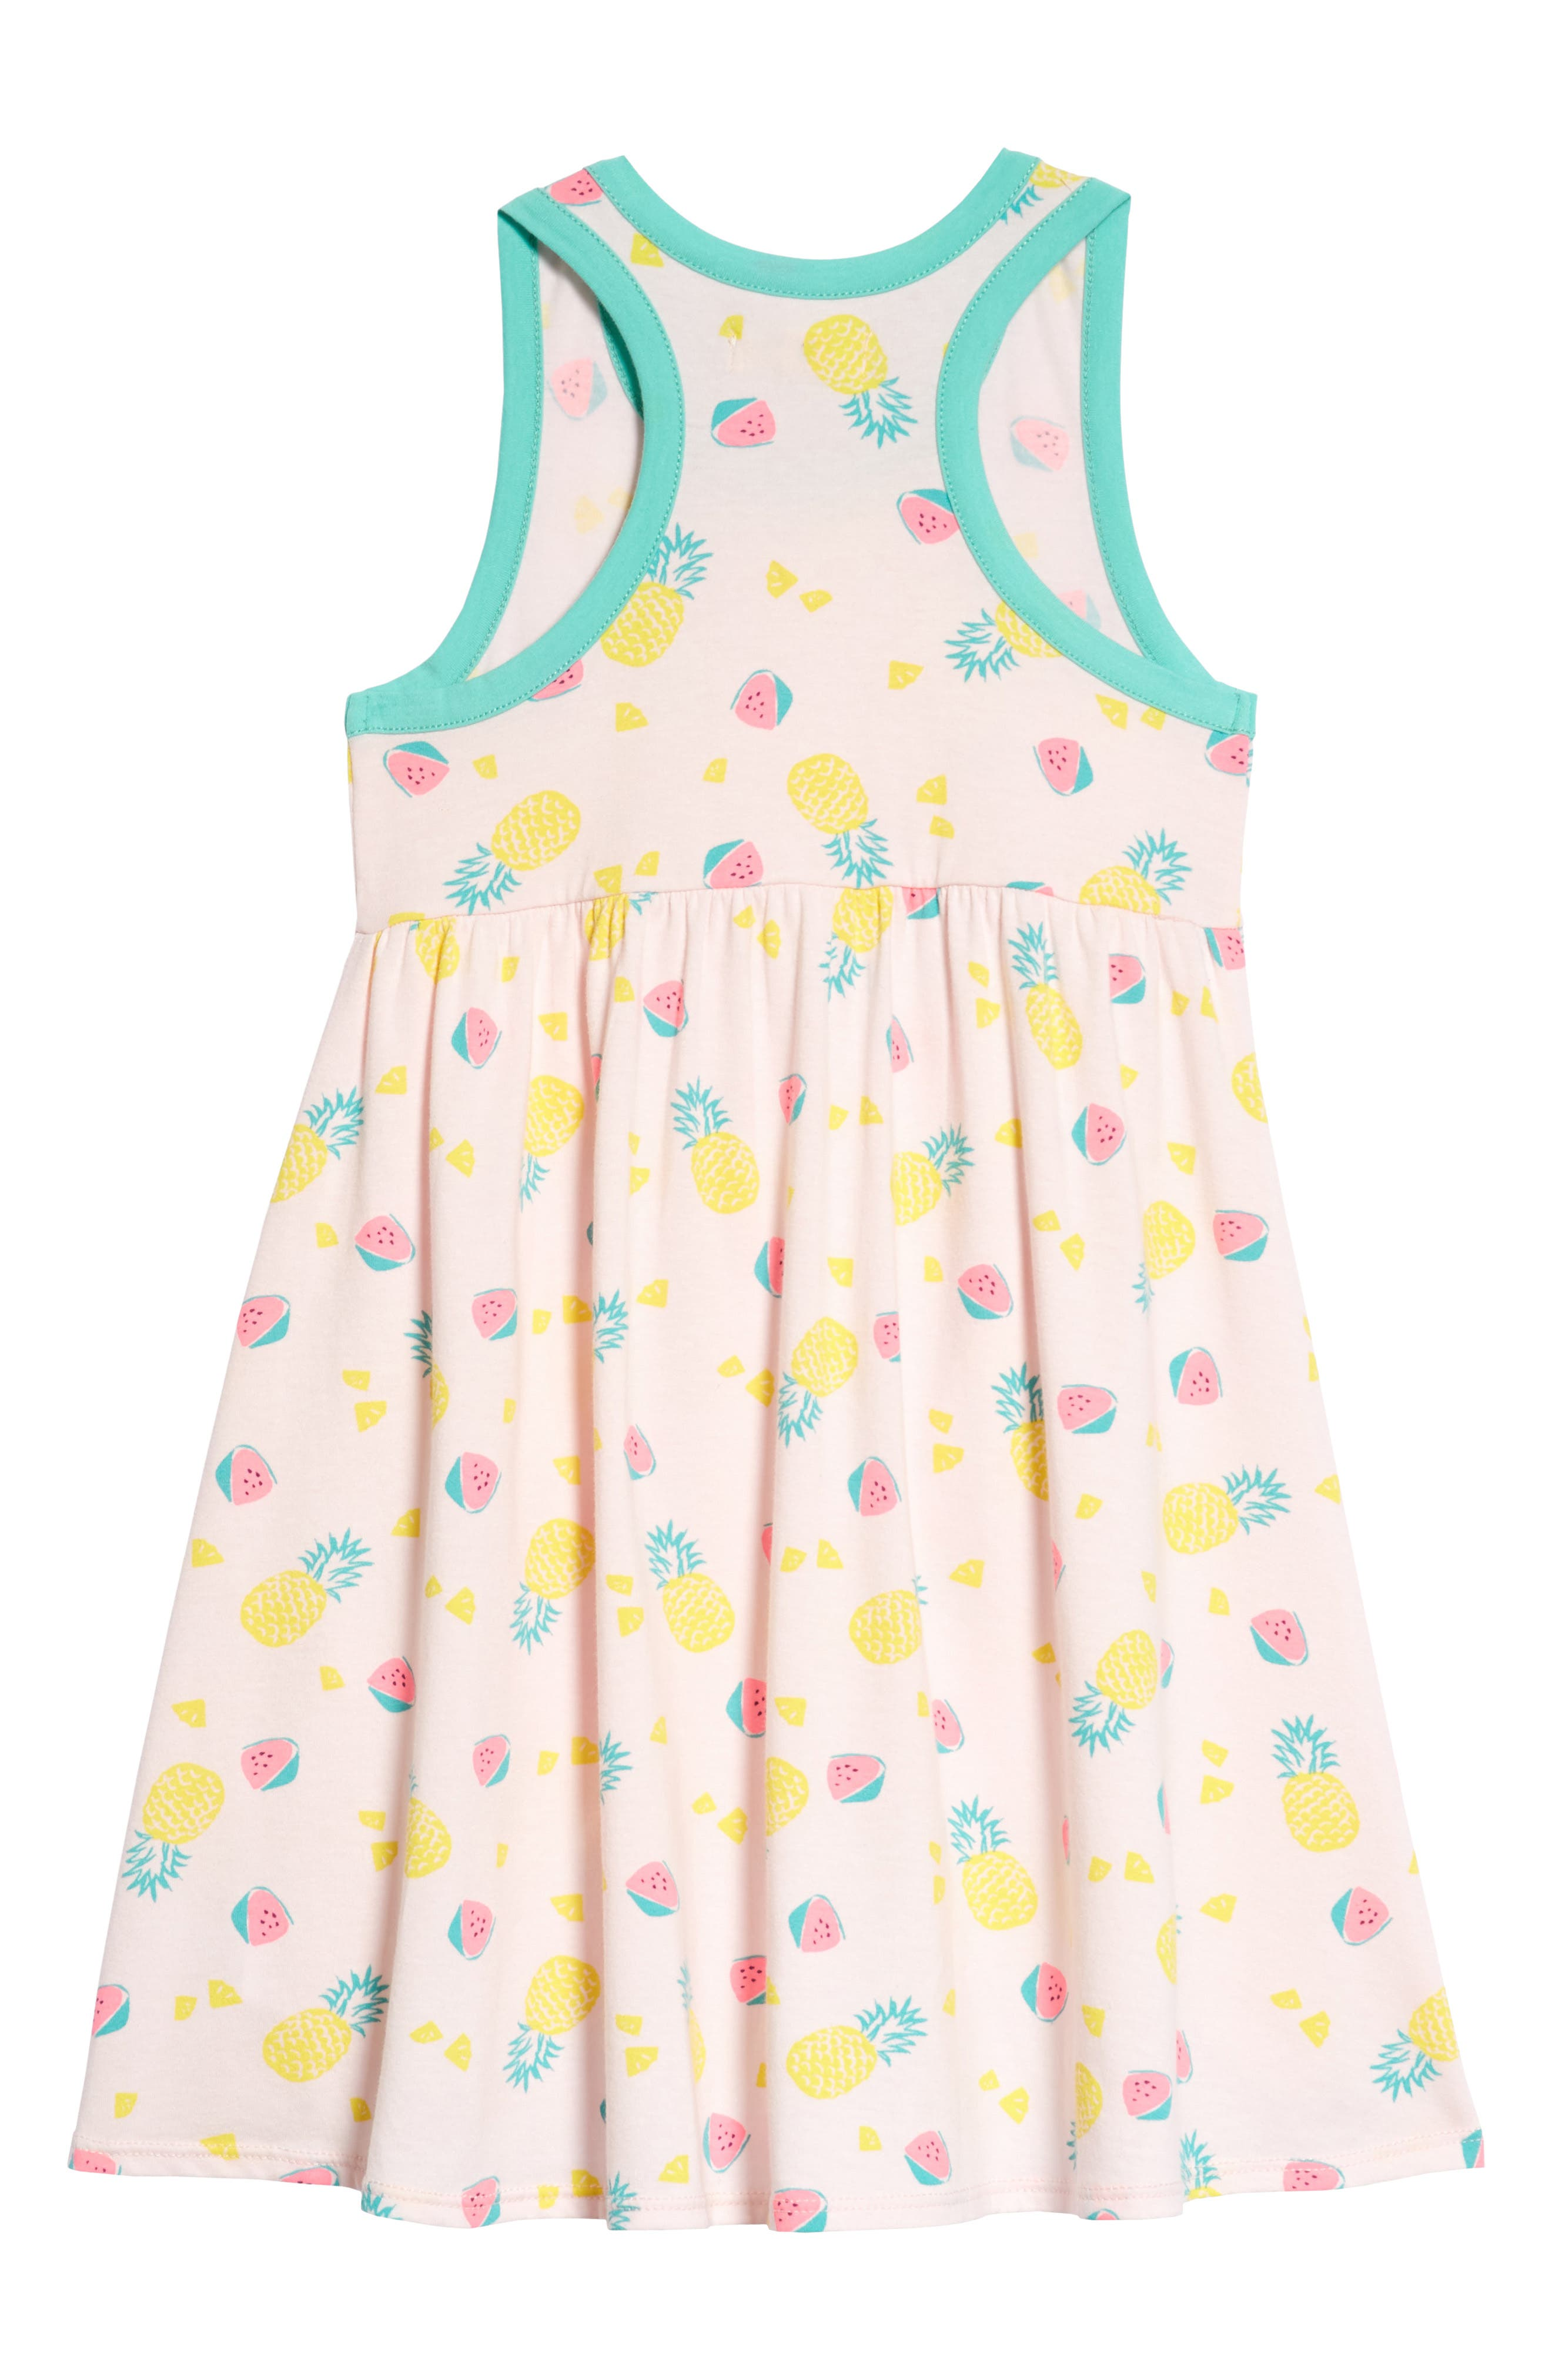 Racerback Tank Dress,                             Alternate thumbnail 2, color,                             Pink Breath Fruits